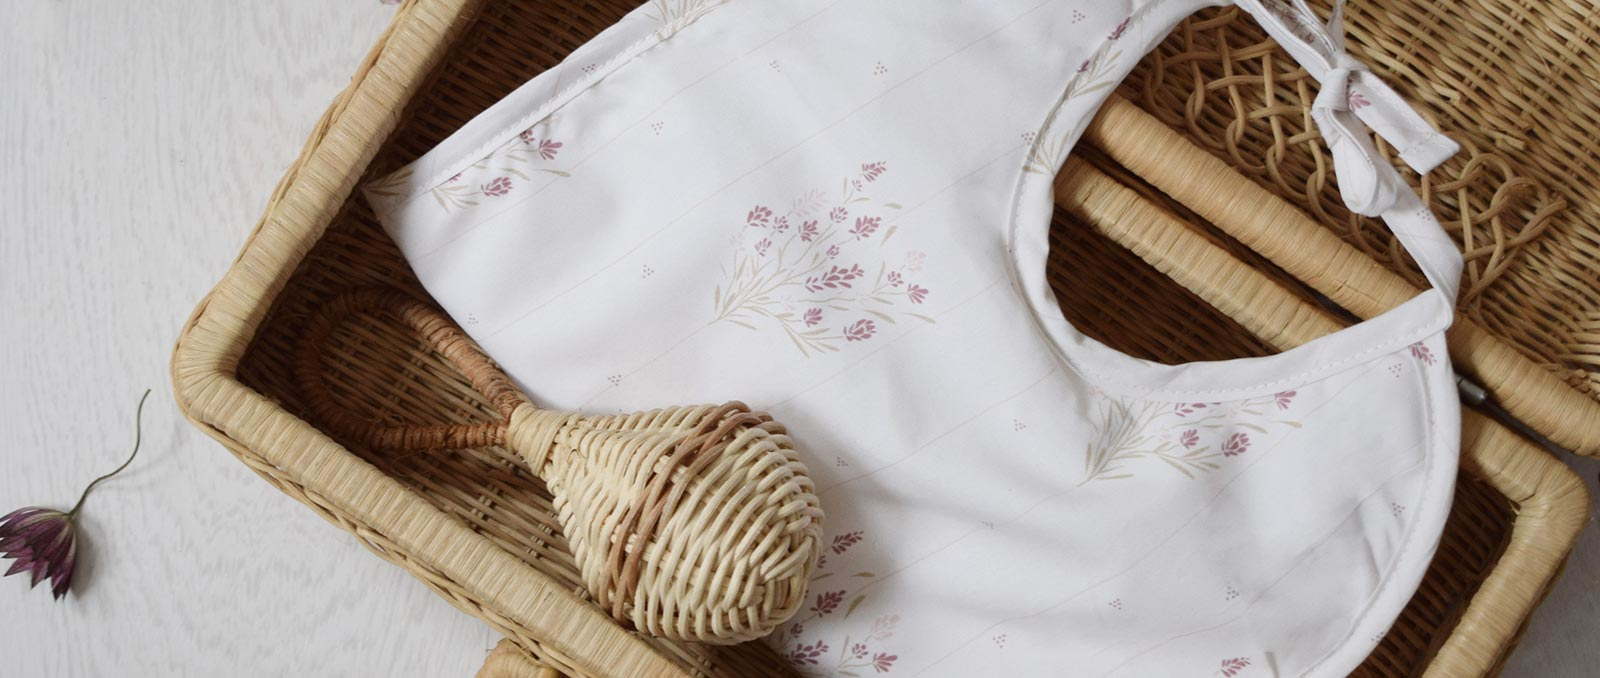 madeleine-poudre-maison-charlotte